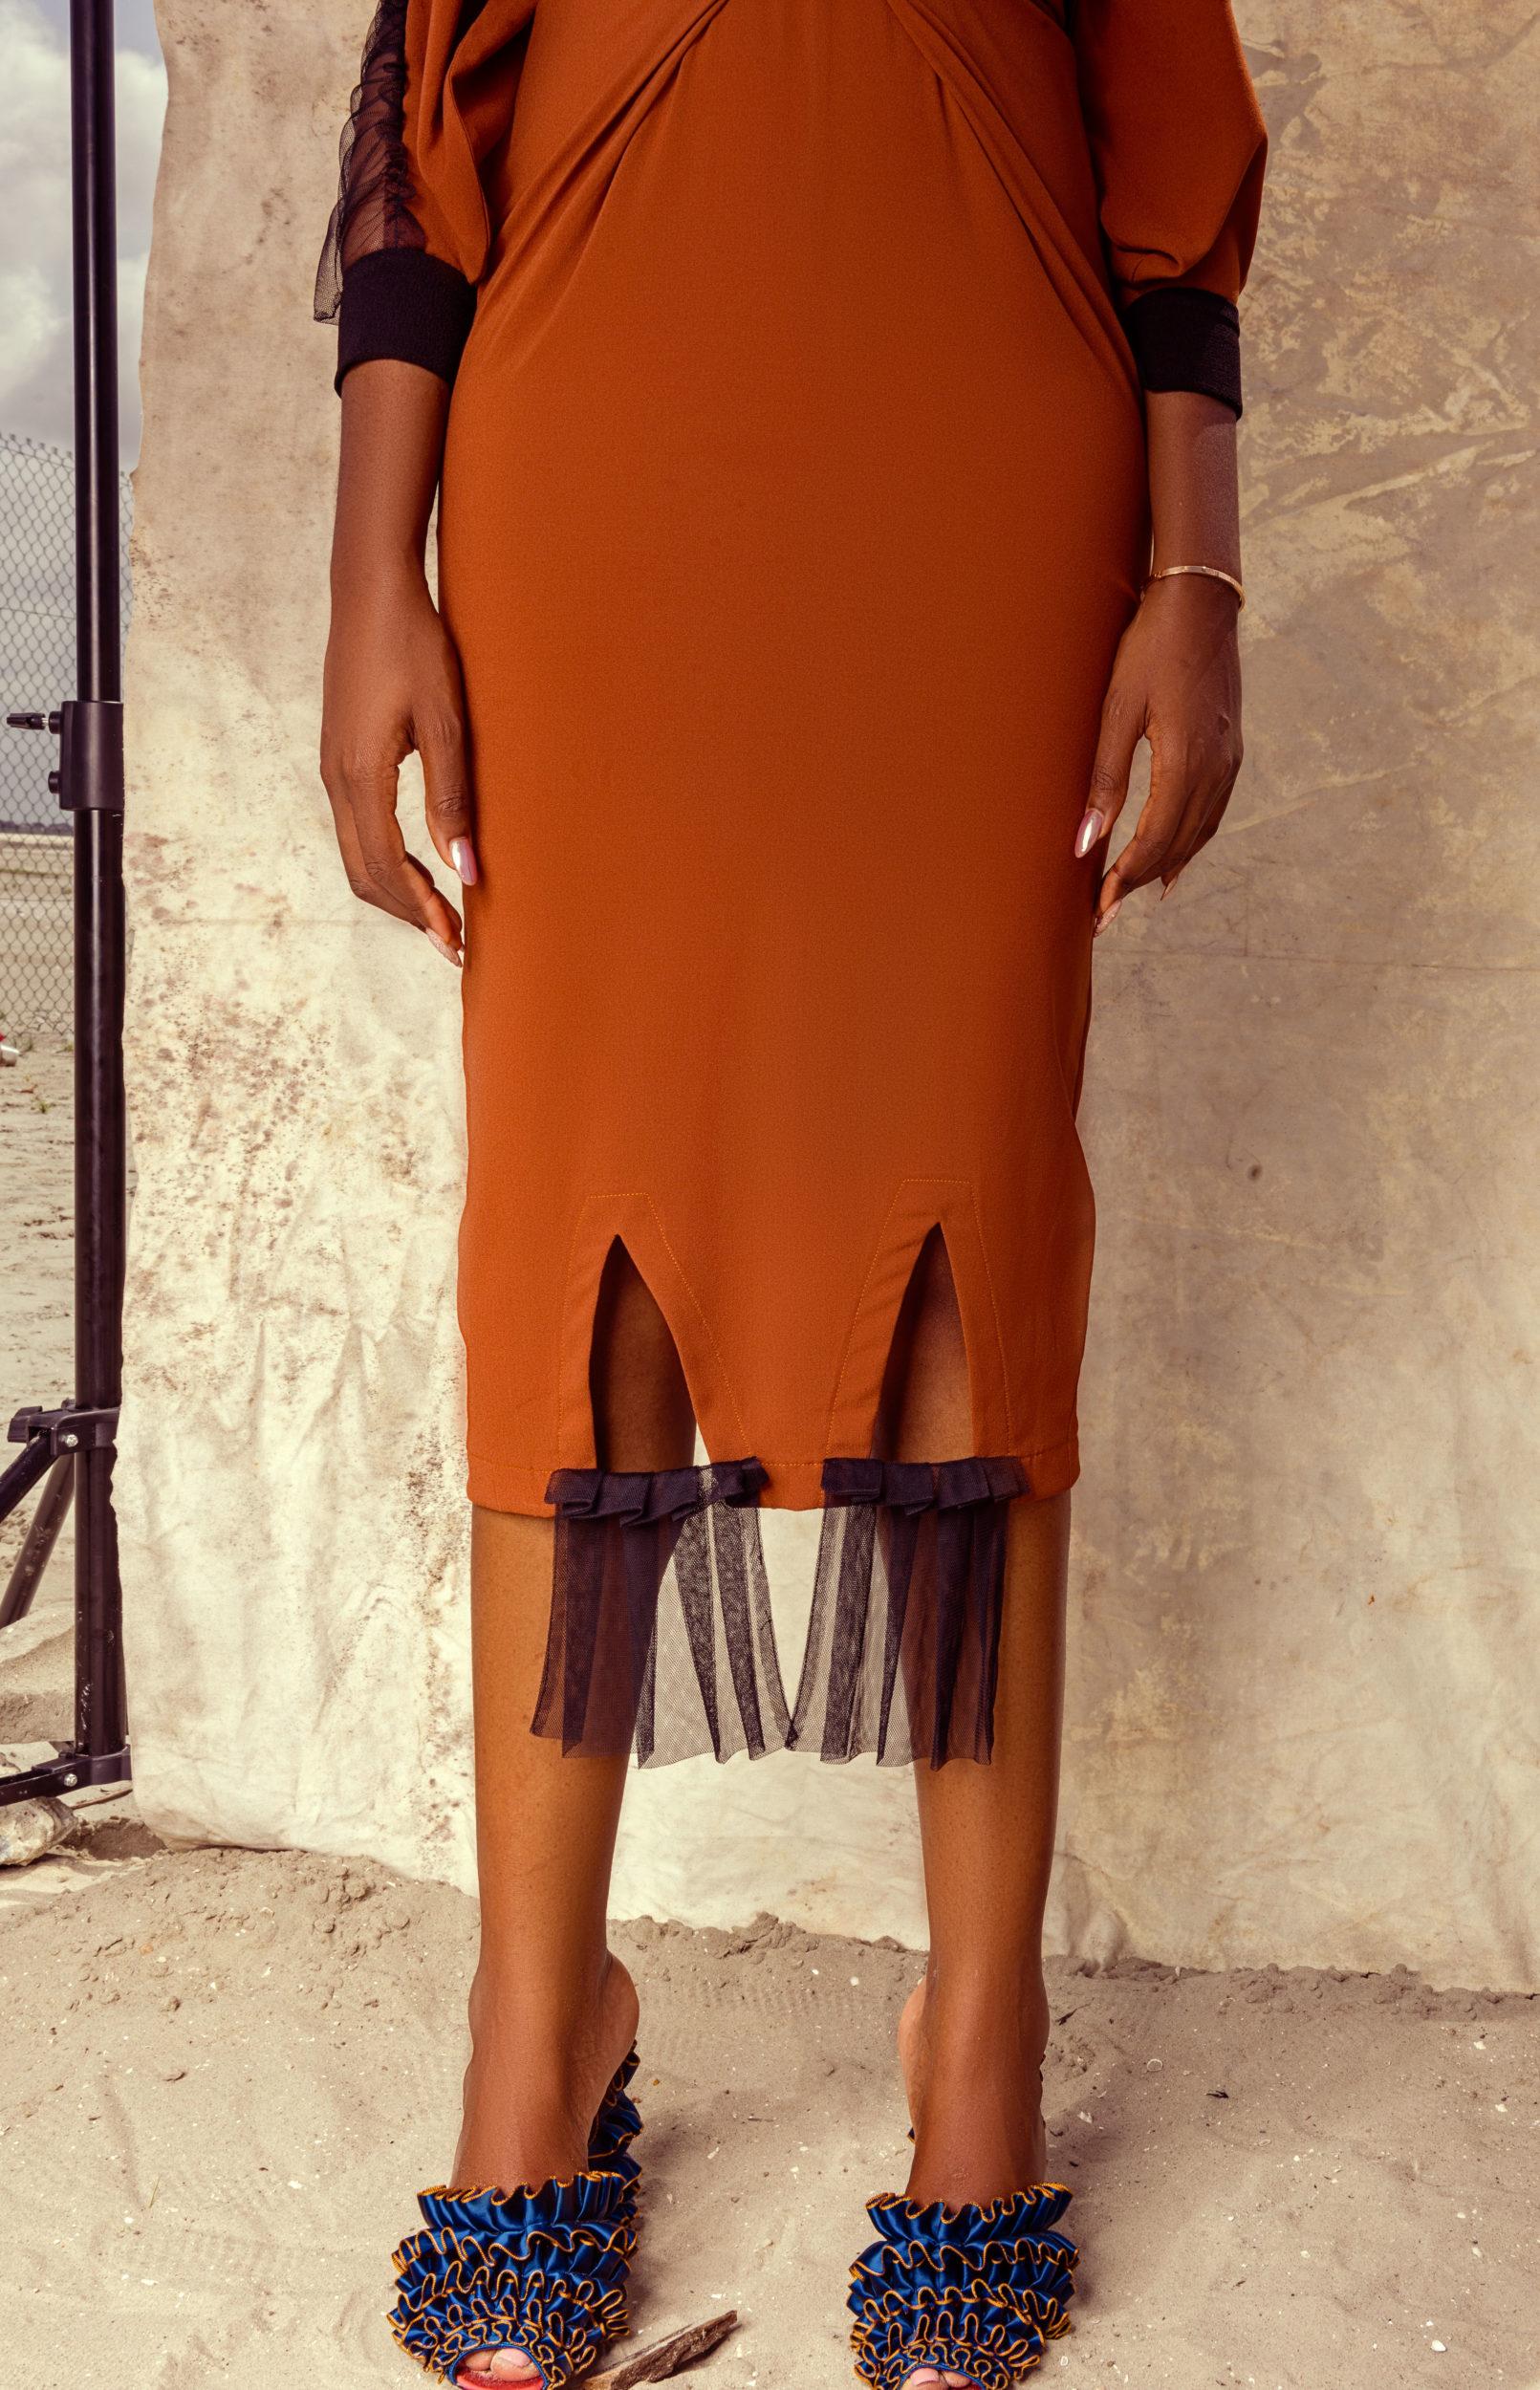 Set Your Wardrobe Alight with Wana Sambo's Wildfire Collection